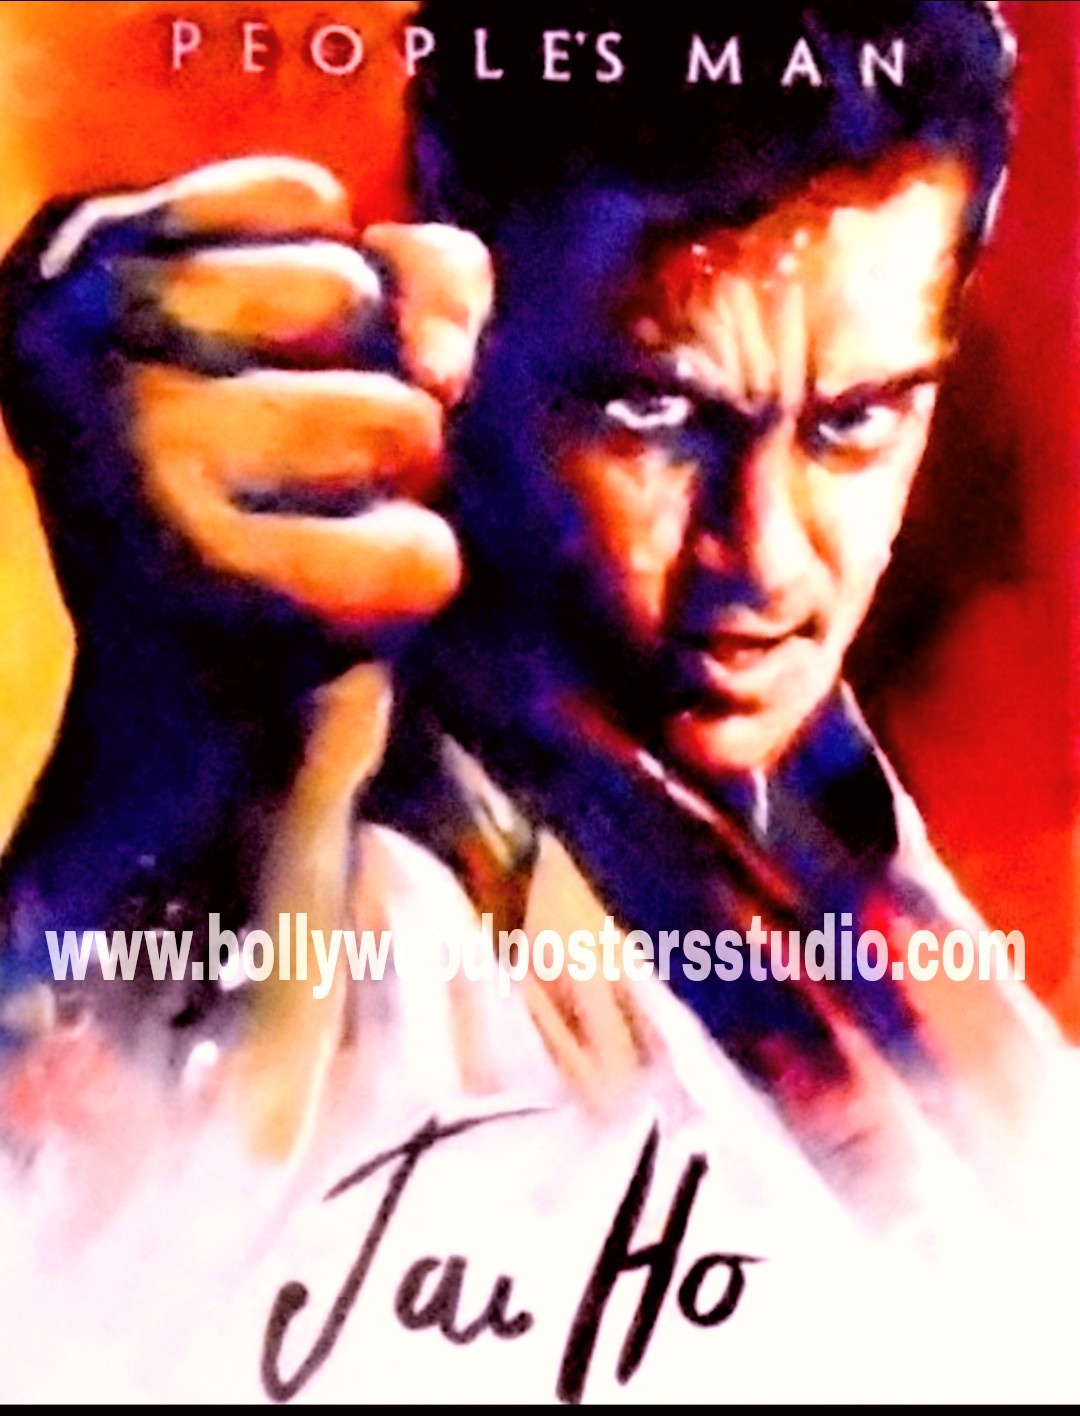 Hand painting Bollywood film fan poster artists Mumbai, India